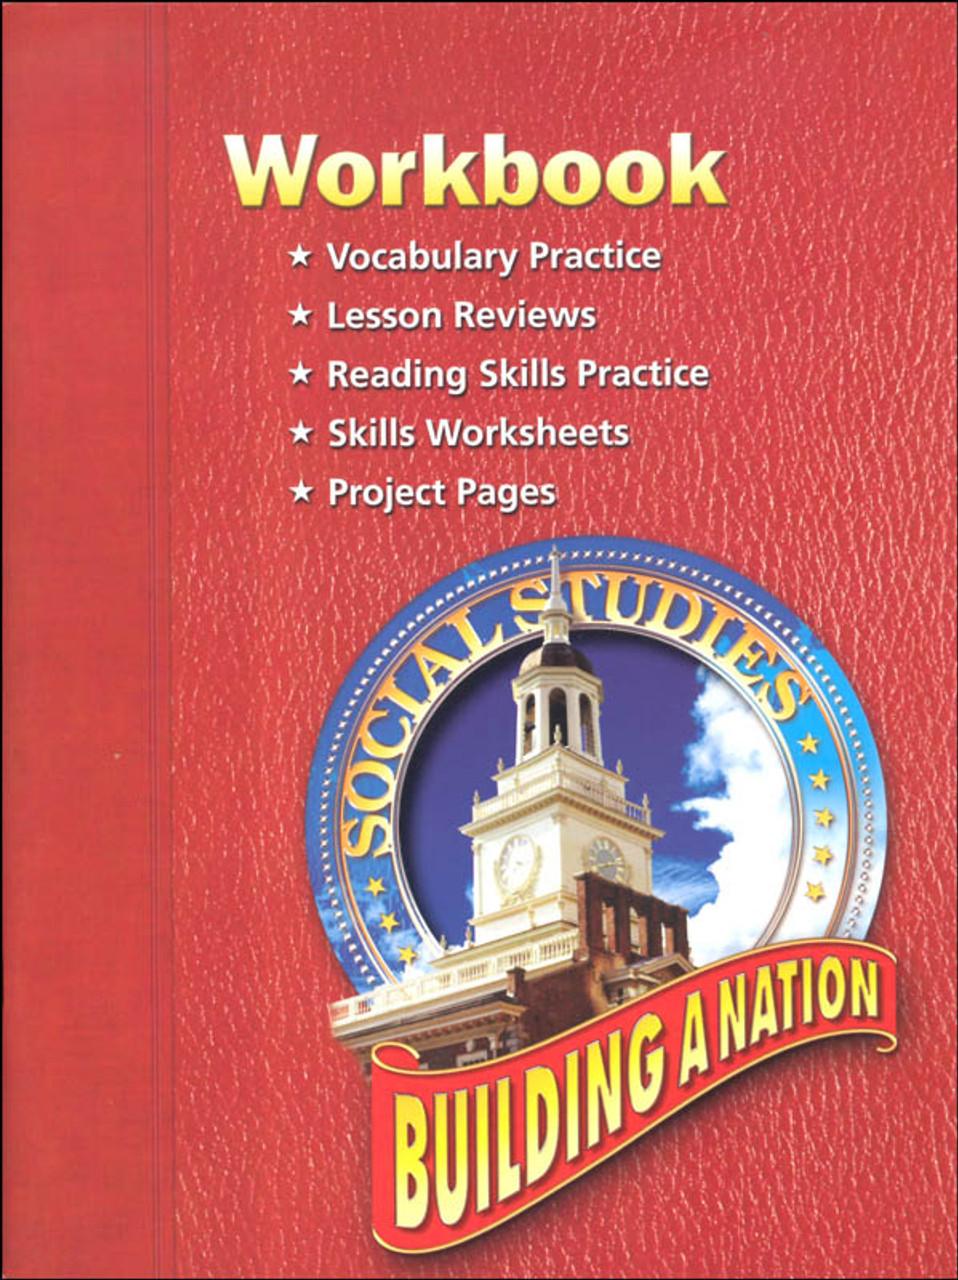 medium resolution of Scott Foresman Social Studies Grade 6 Student Workbook - Building A Nation  - Classroom Resource Center